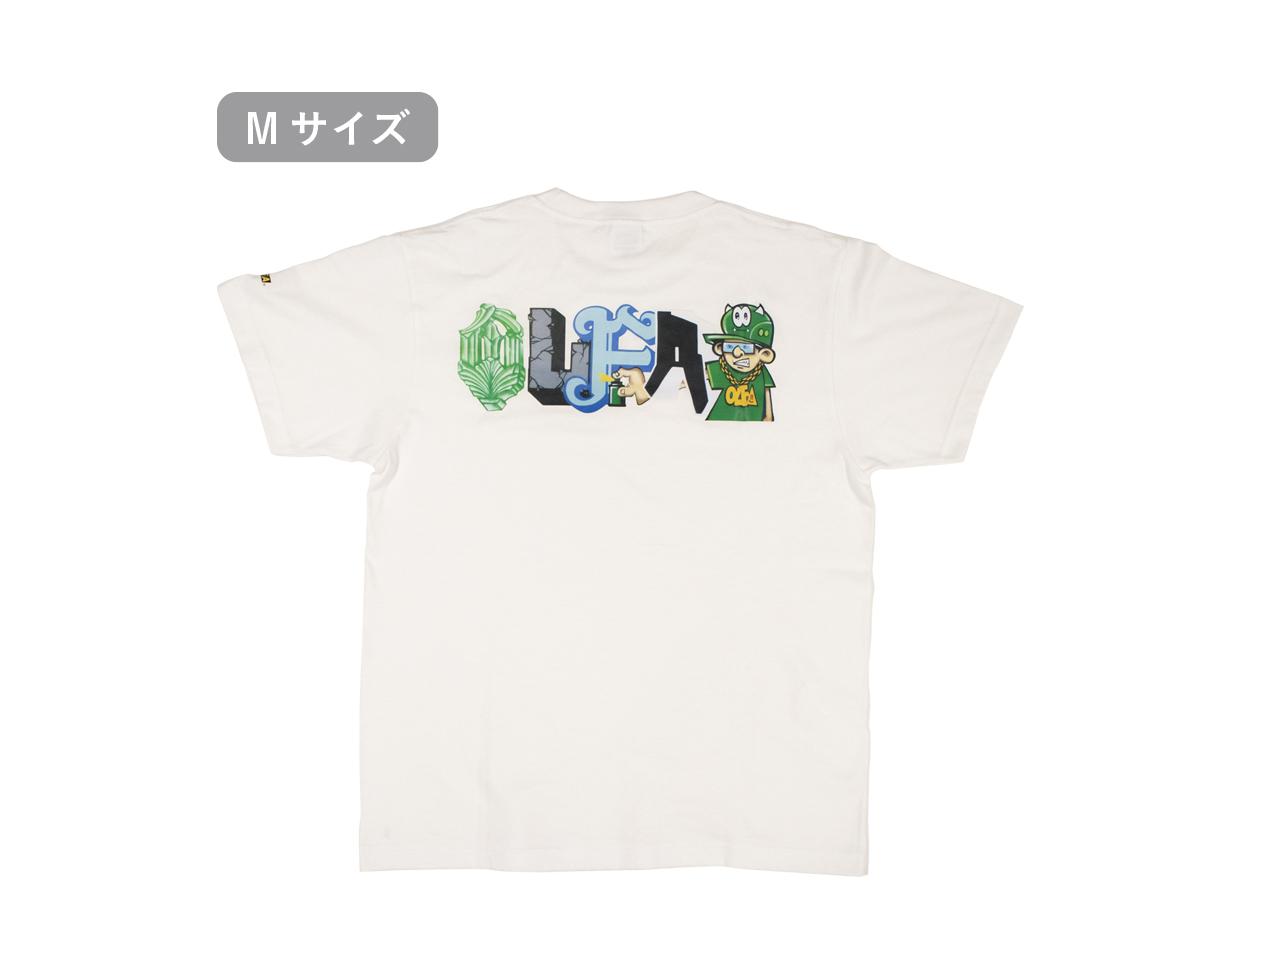 OLFAグラフィティアートTシャツ(Mサイズ)